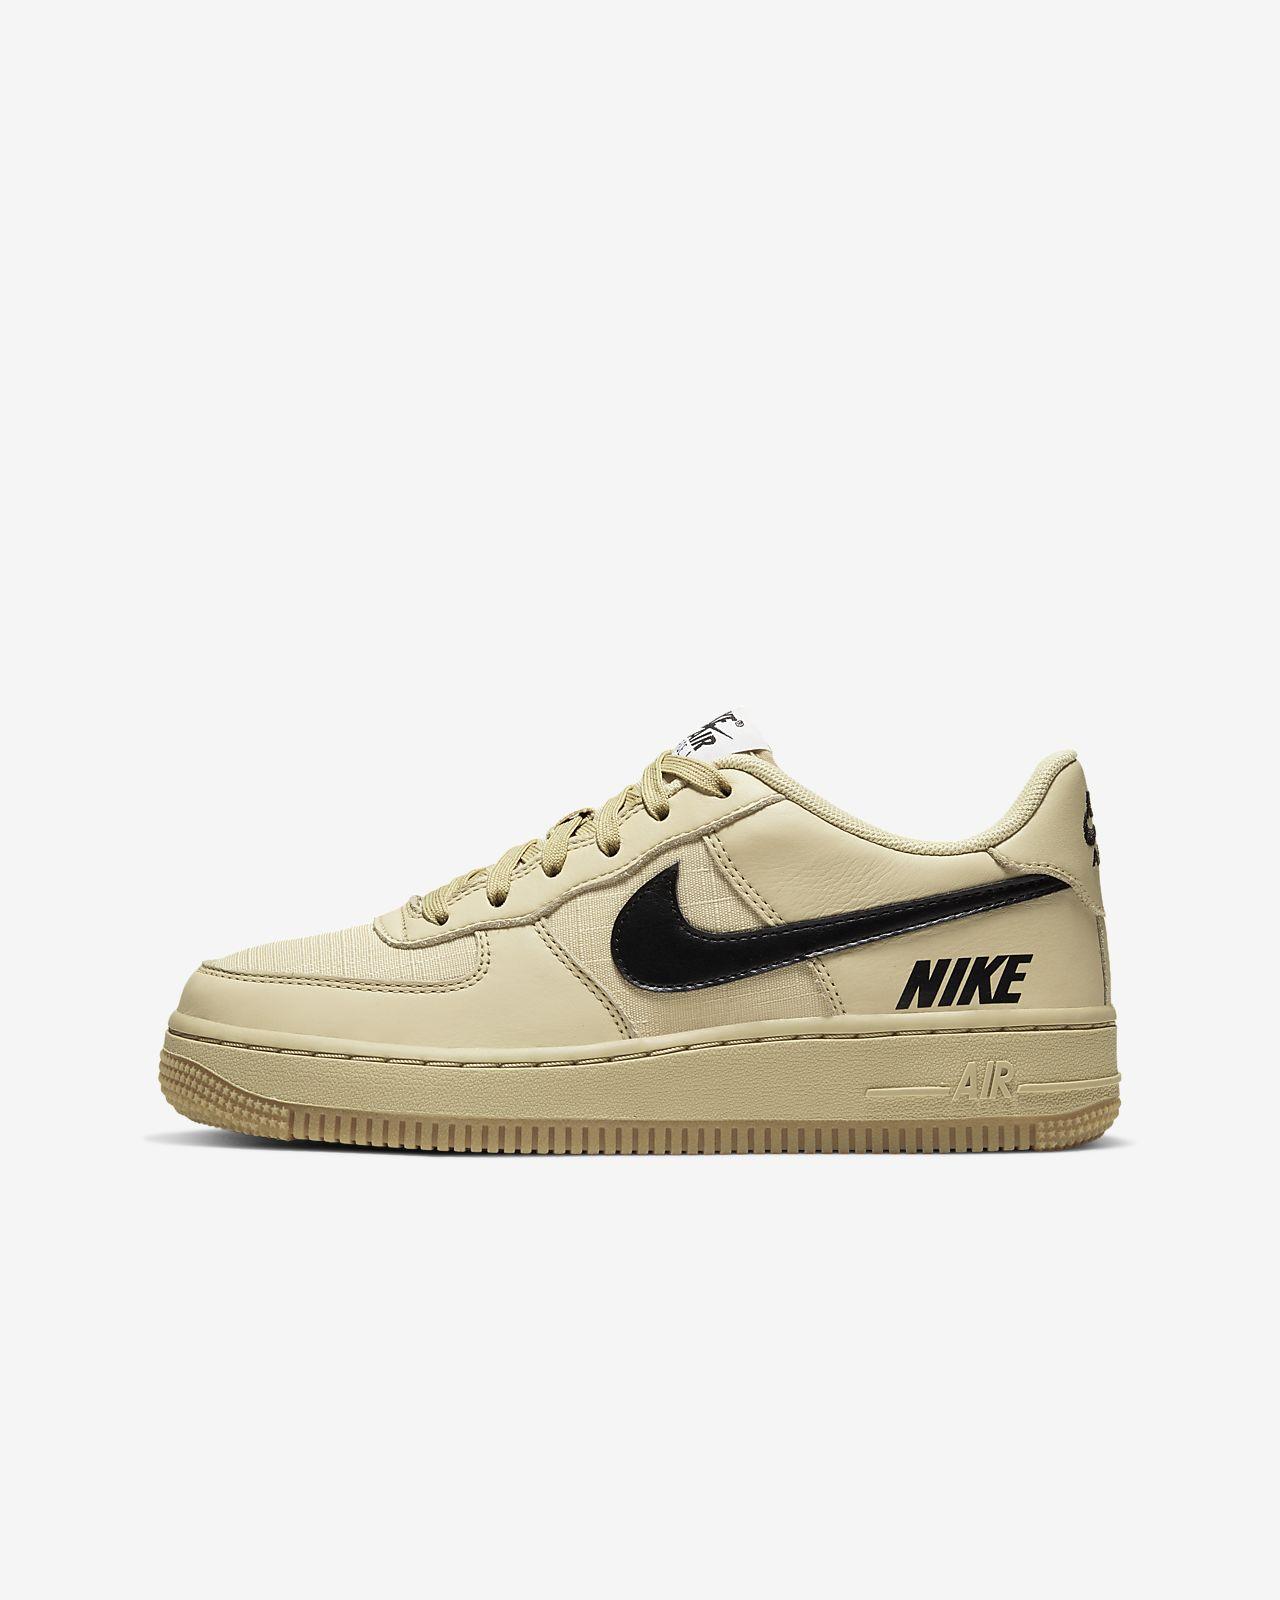 Nike Air Force 1 LV8 5 Big Kids' Shoe